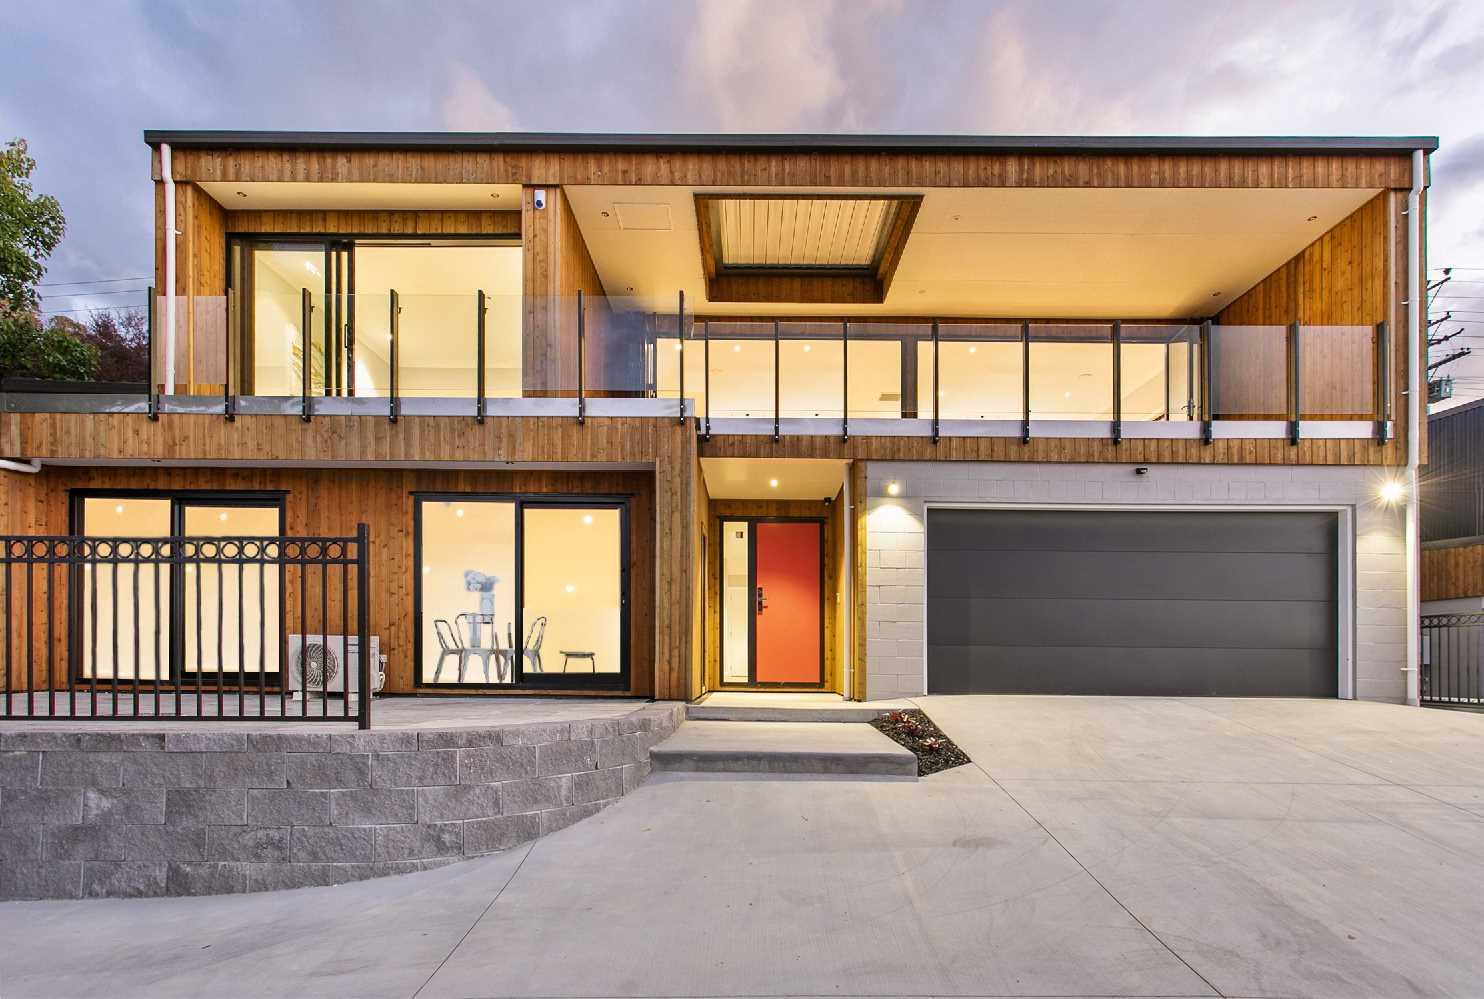 Orewa Heights Estate Luxury Home and Income